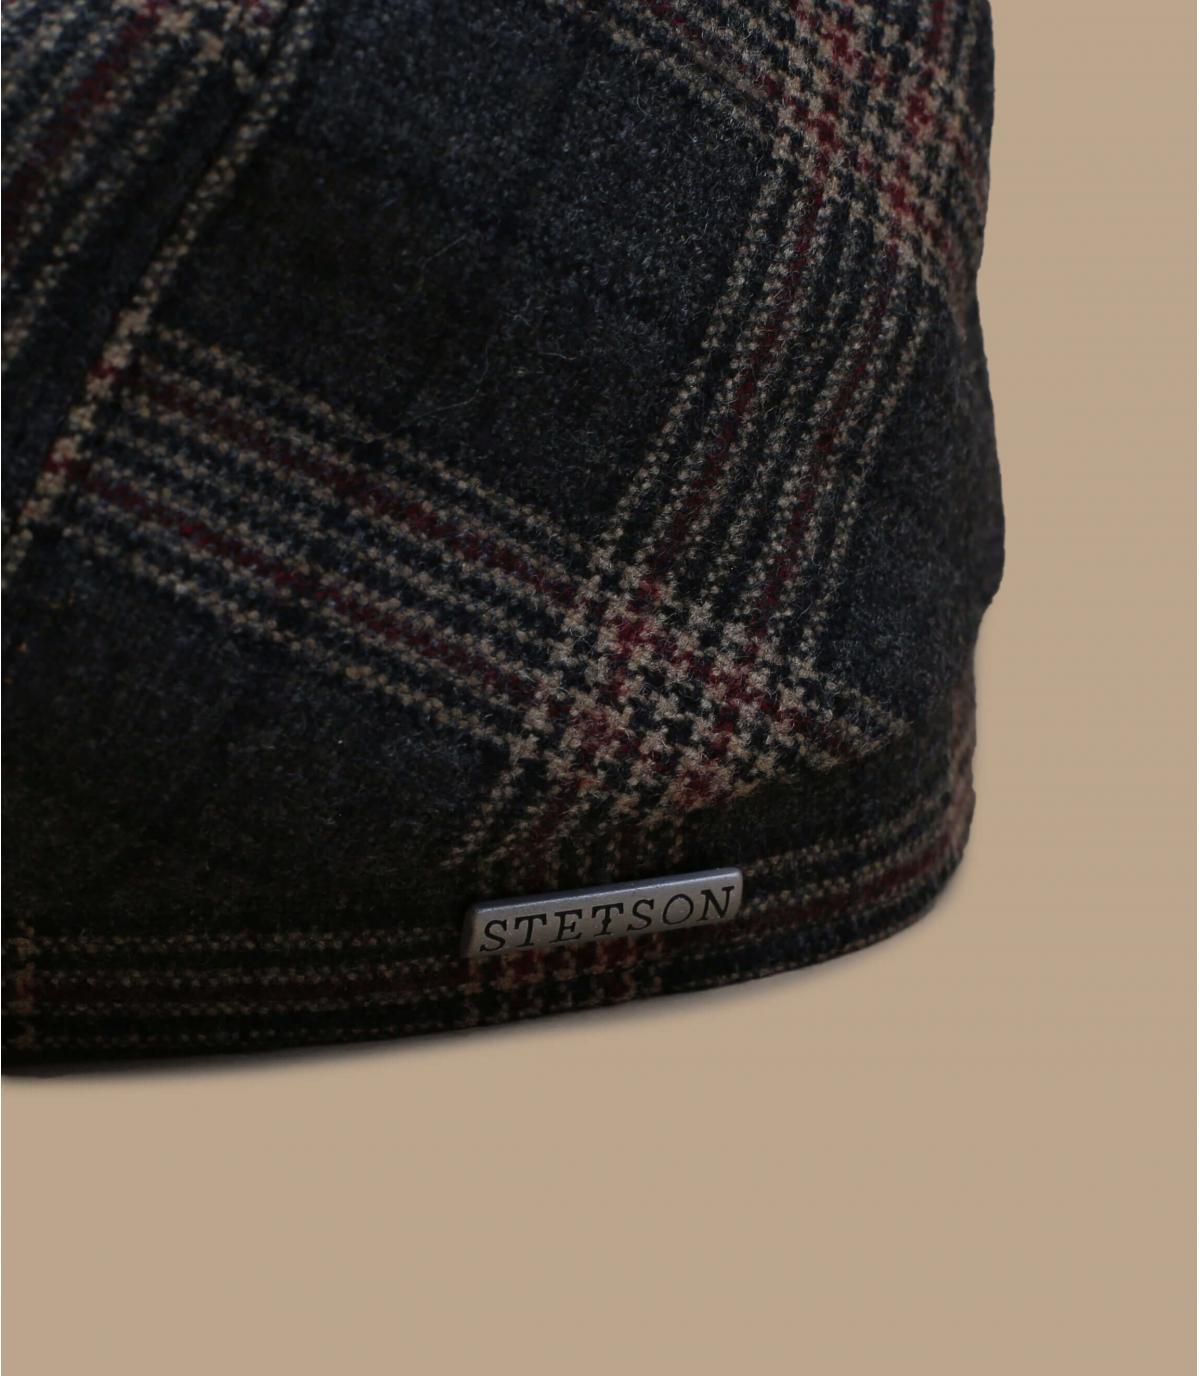 Détails 6-Panel Cap Wool Check grey brown - image 2